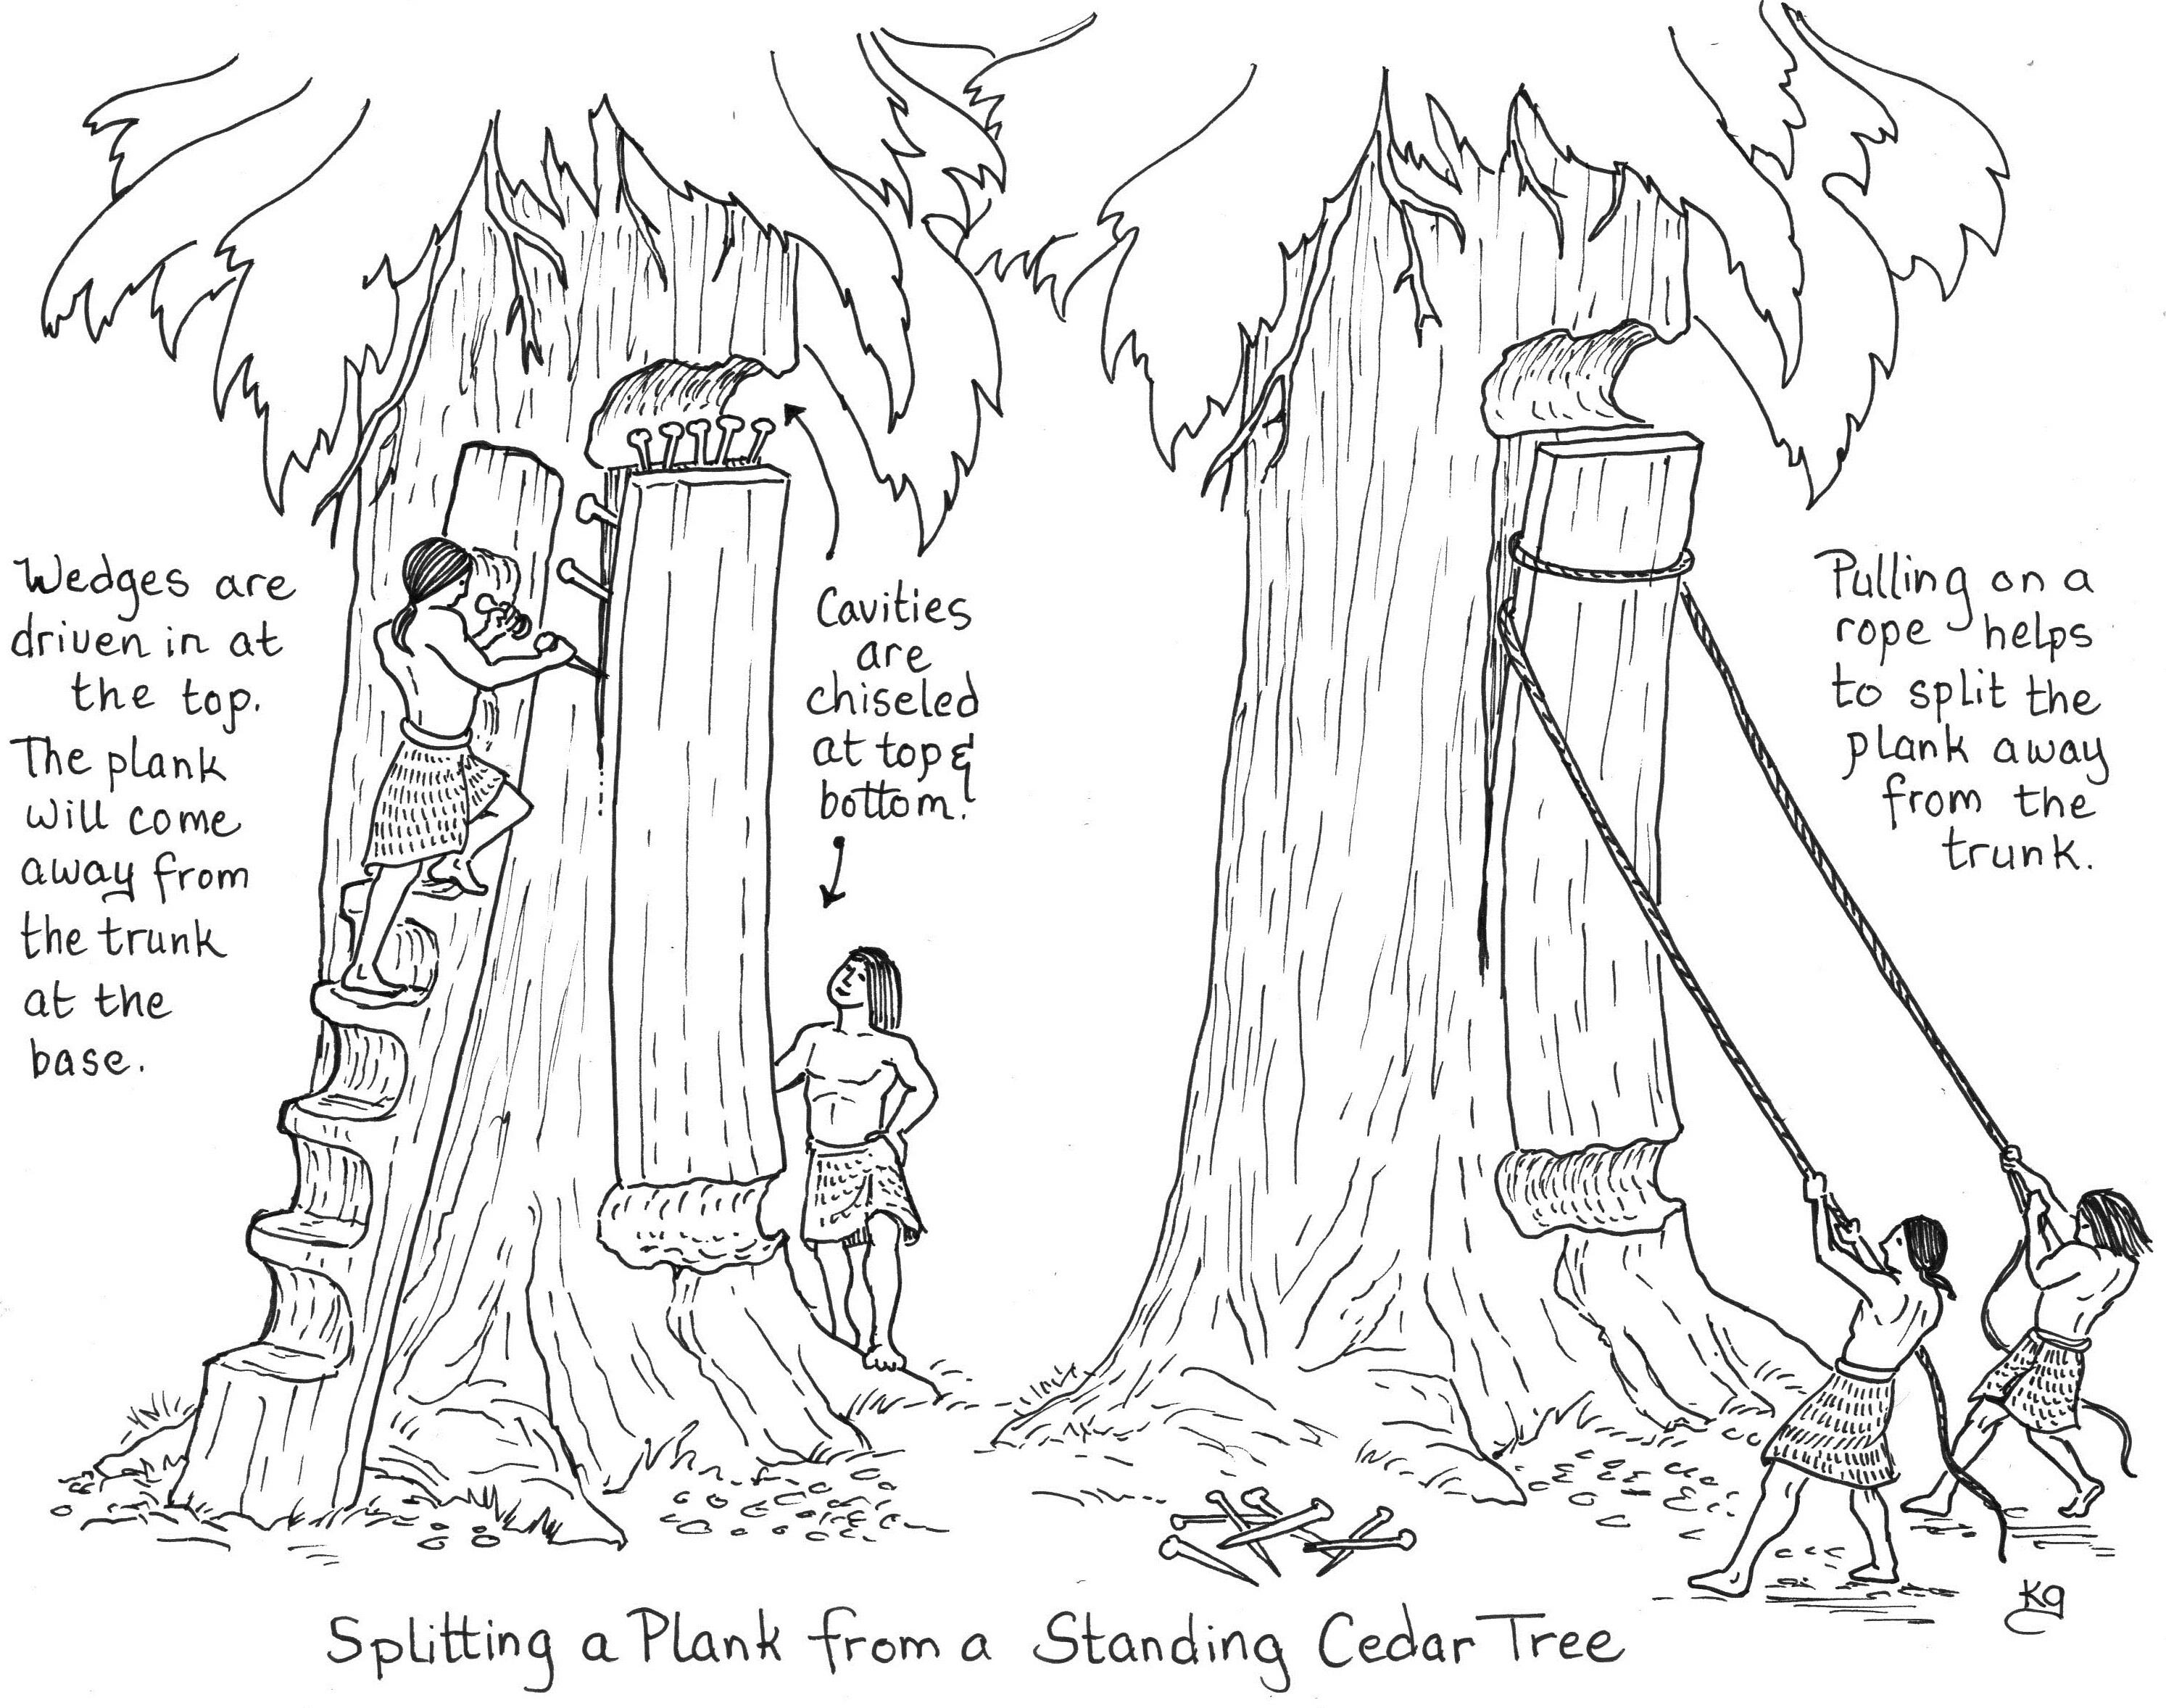 Splitting a cedar plank from a standing cedar tree